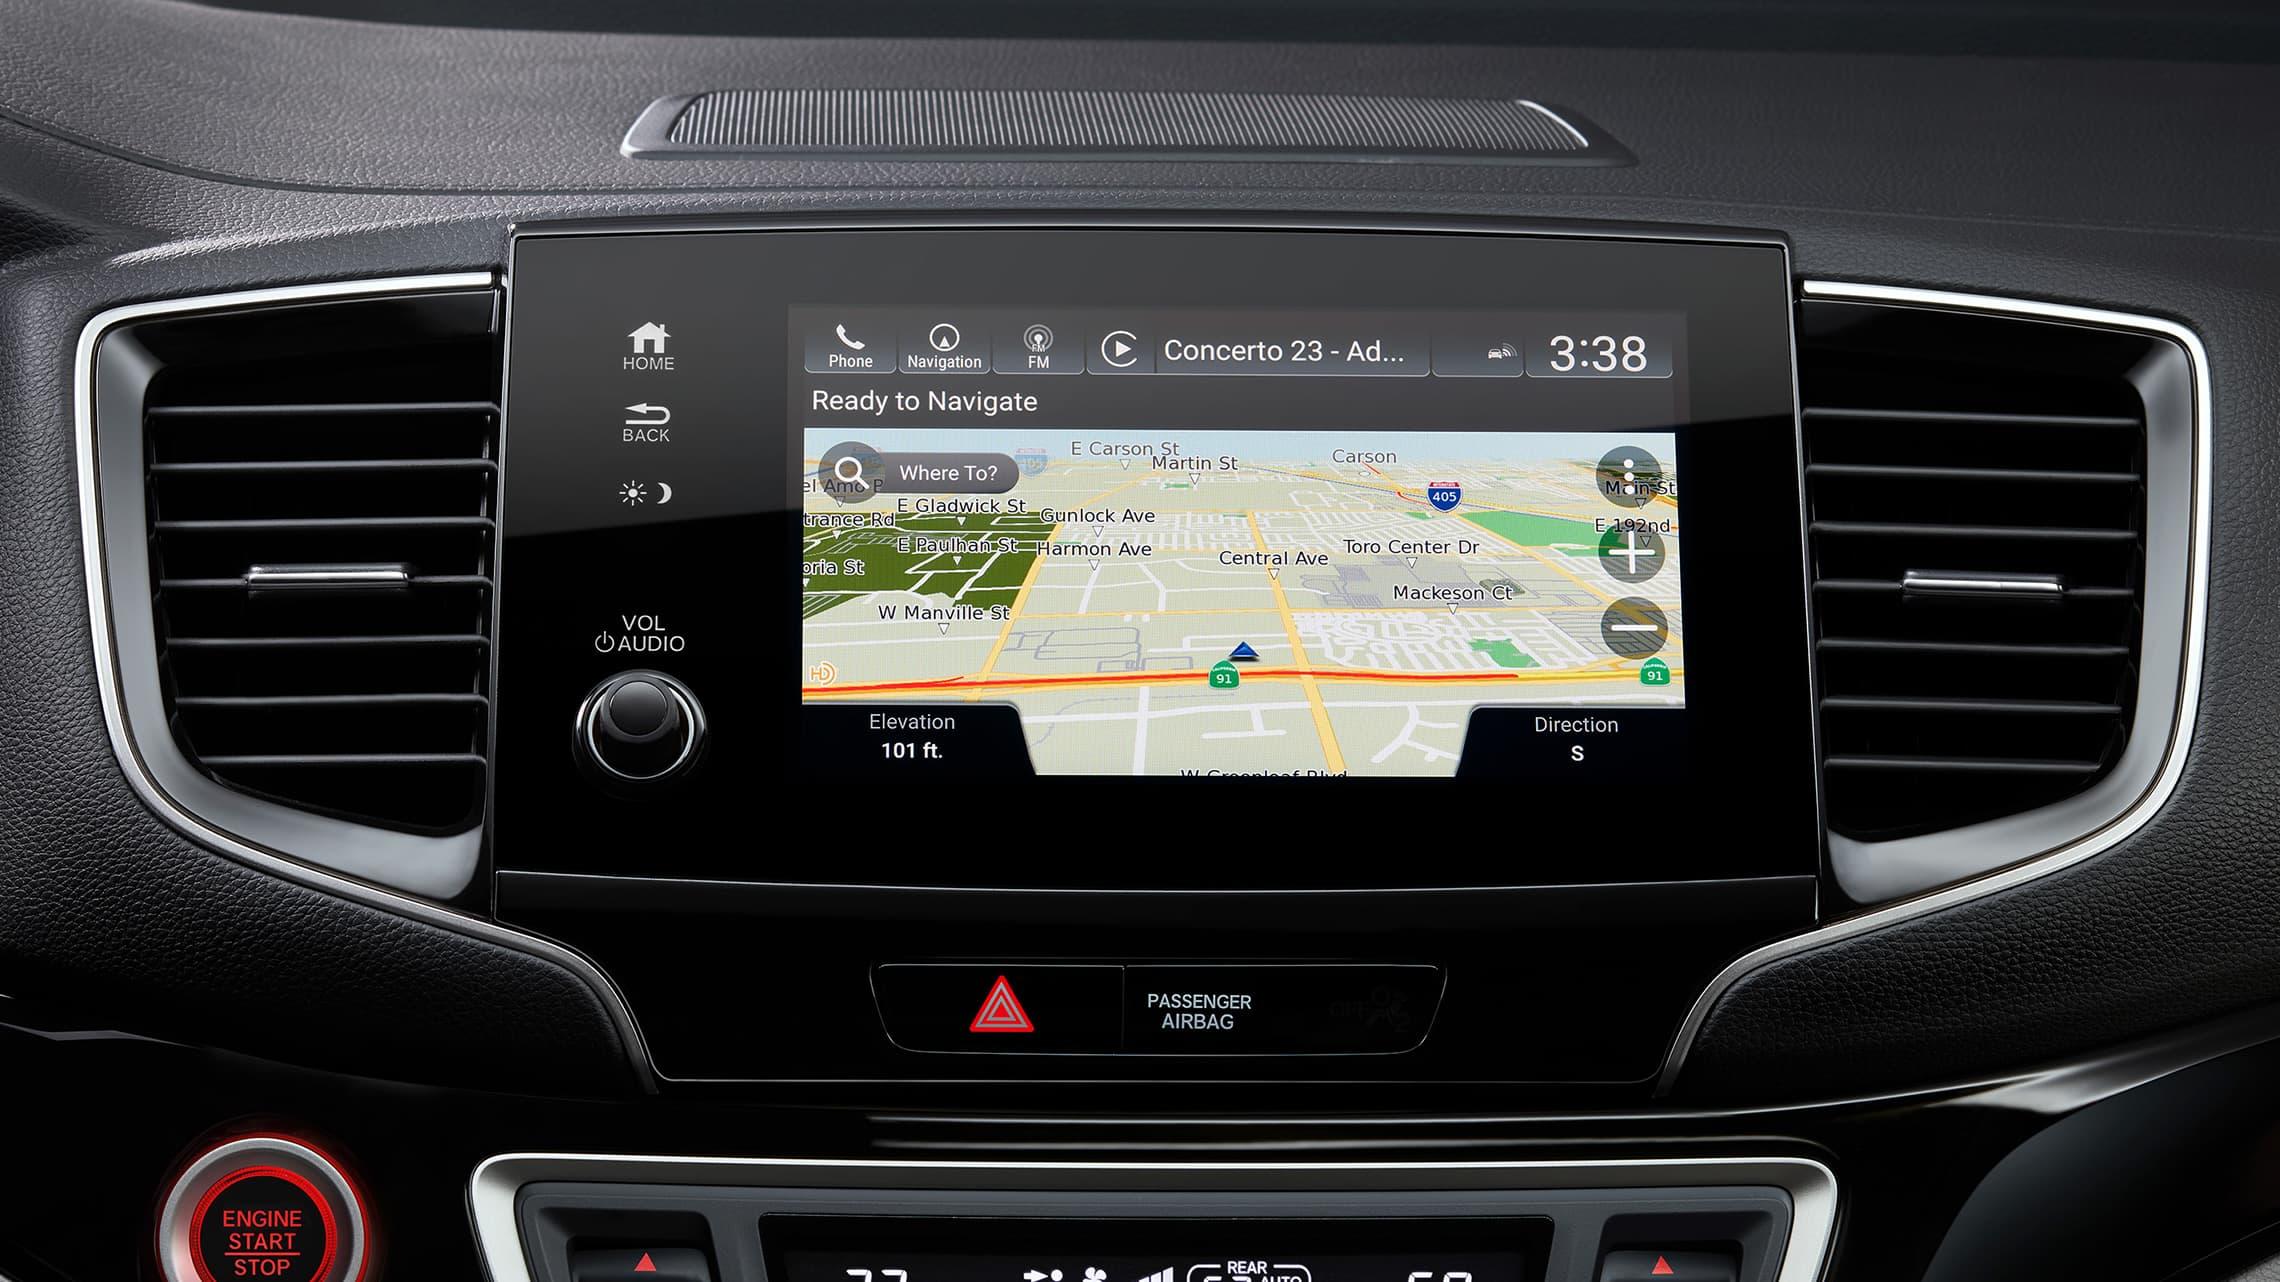 Detalle de la pantalla de inicio de Honda Satellite-Linked Navigation System™ en la pantalla táctil del sistema de audio de la Honda Pilot Elite2020.